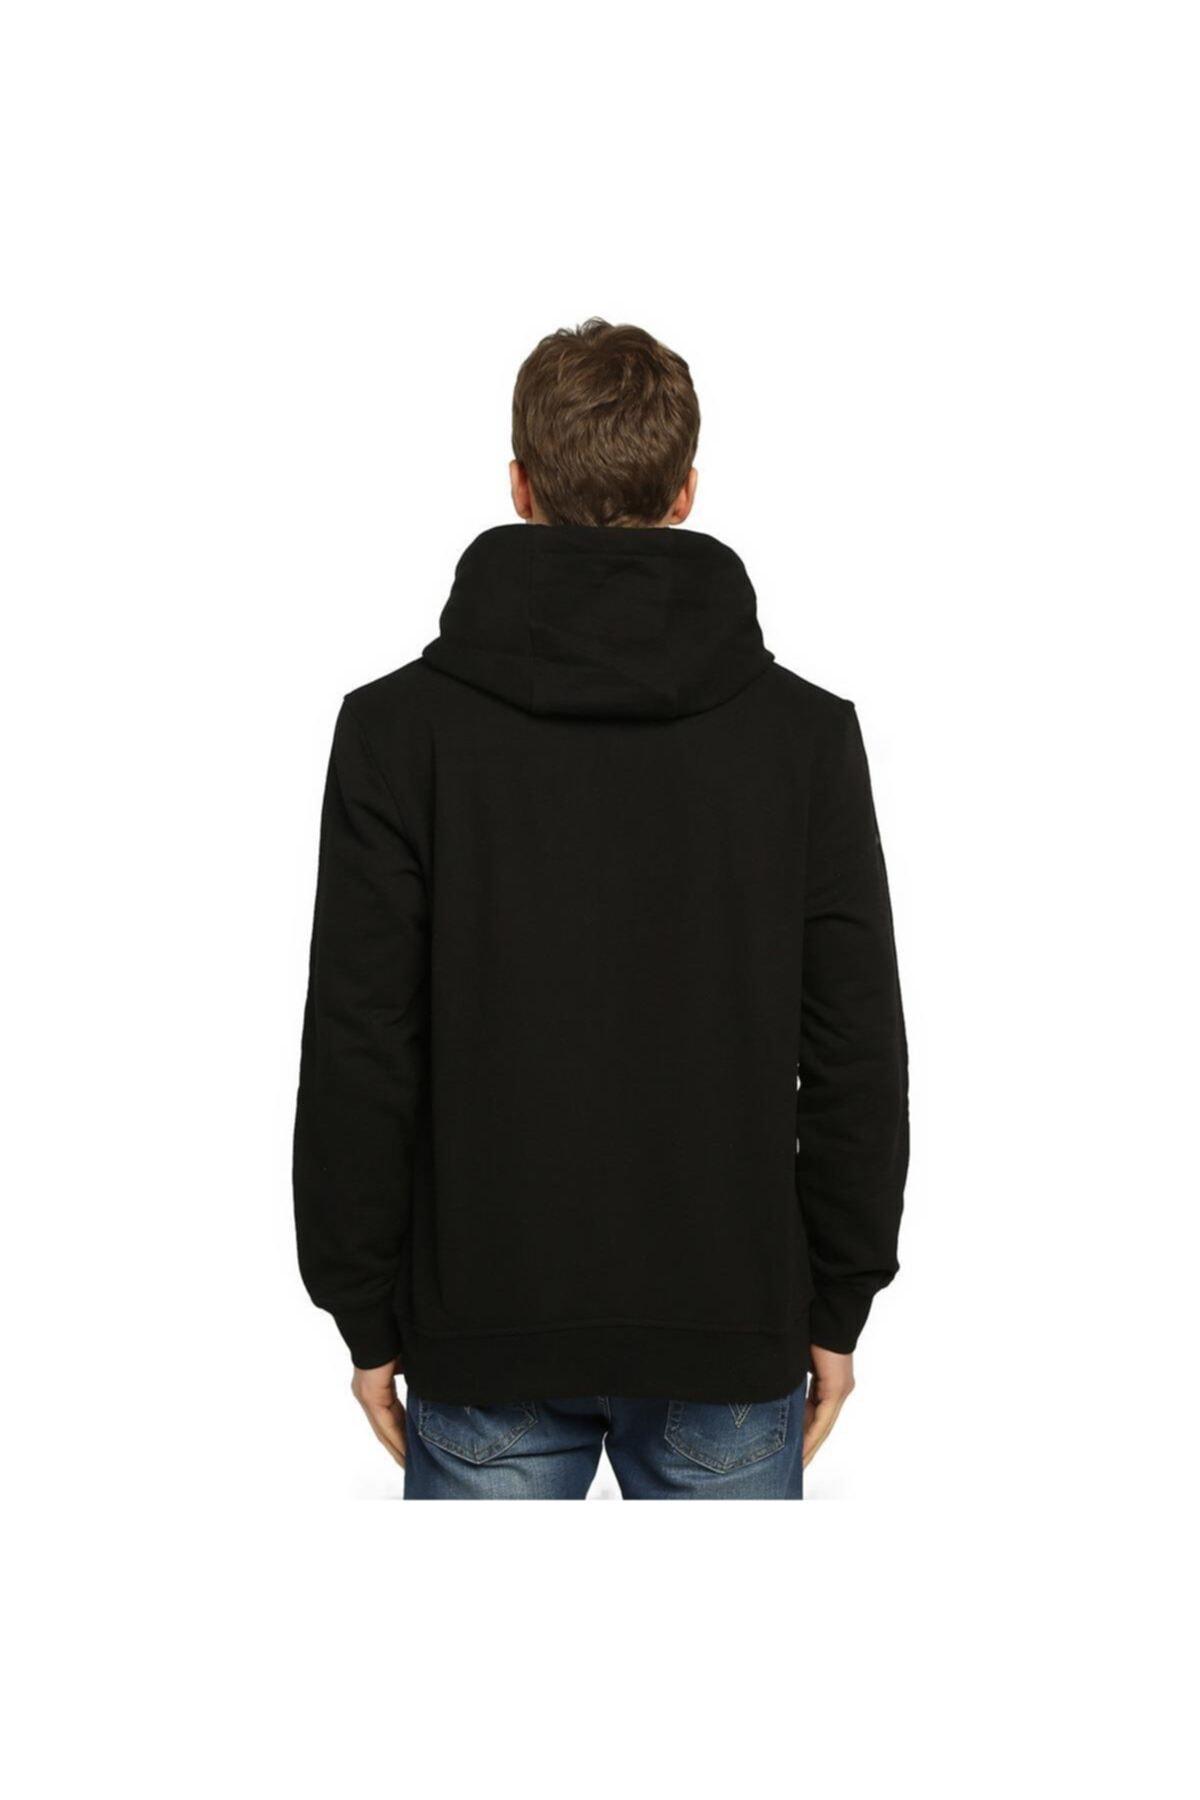 Bant Giyim - Gintama Siyah Kapüşonlu Sweatshirt 2